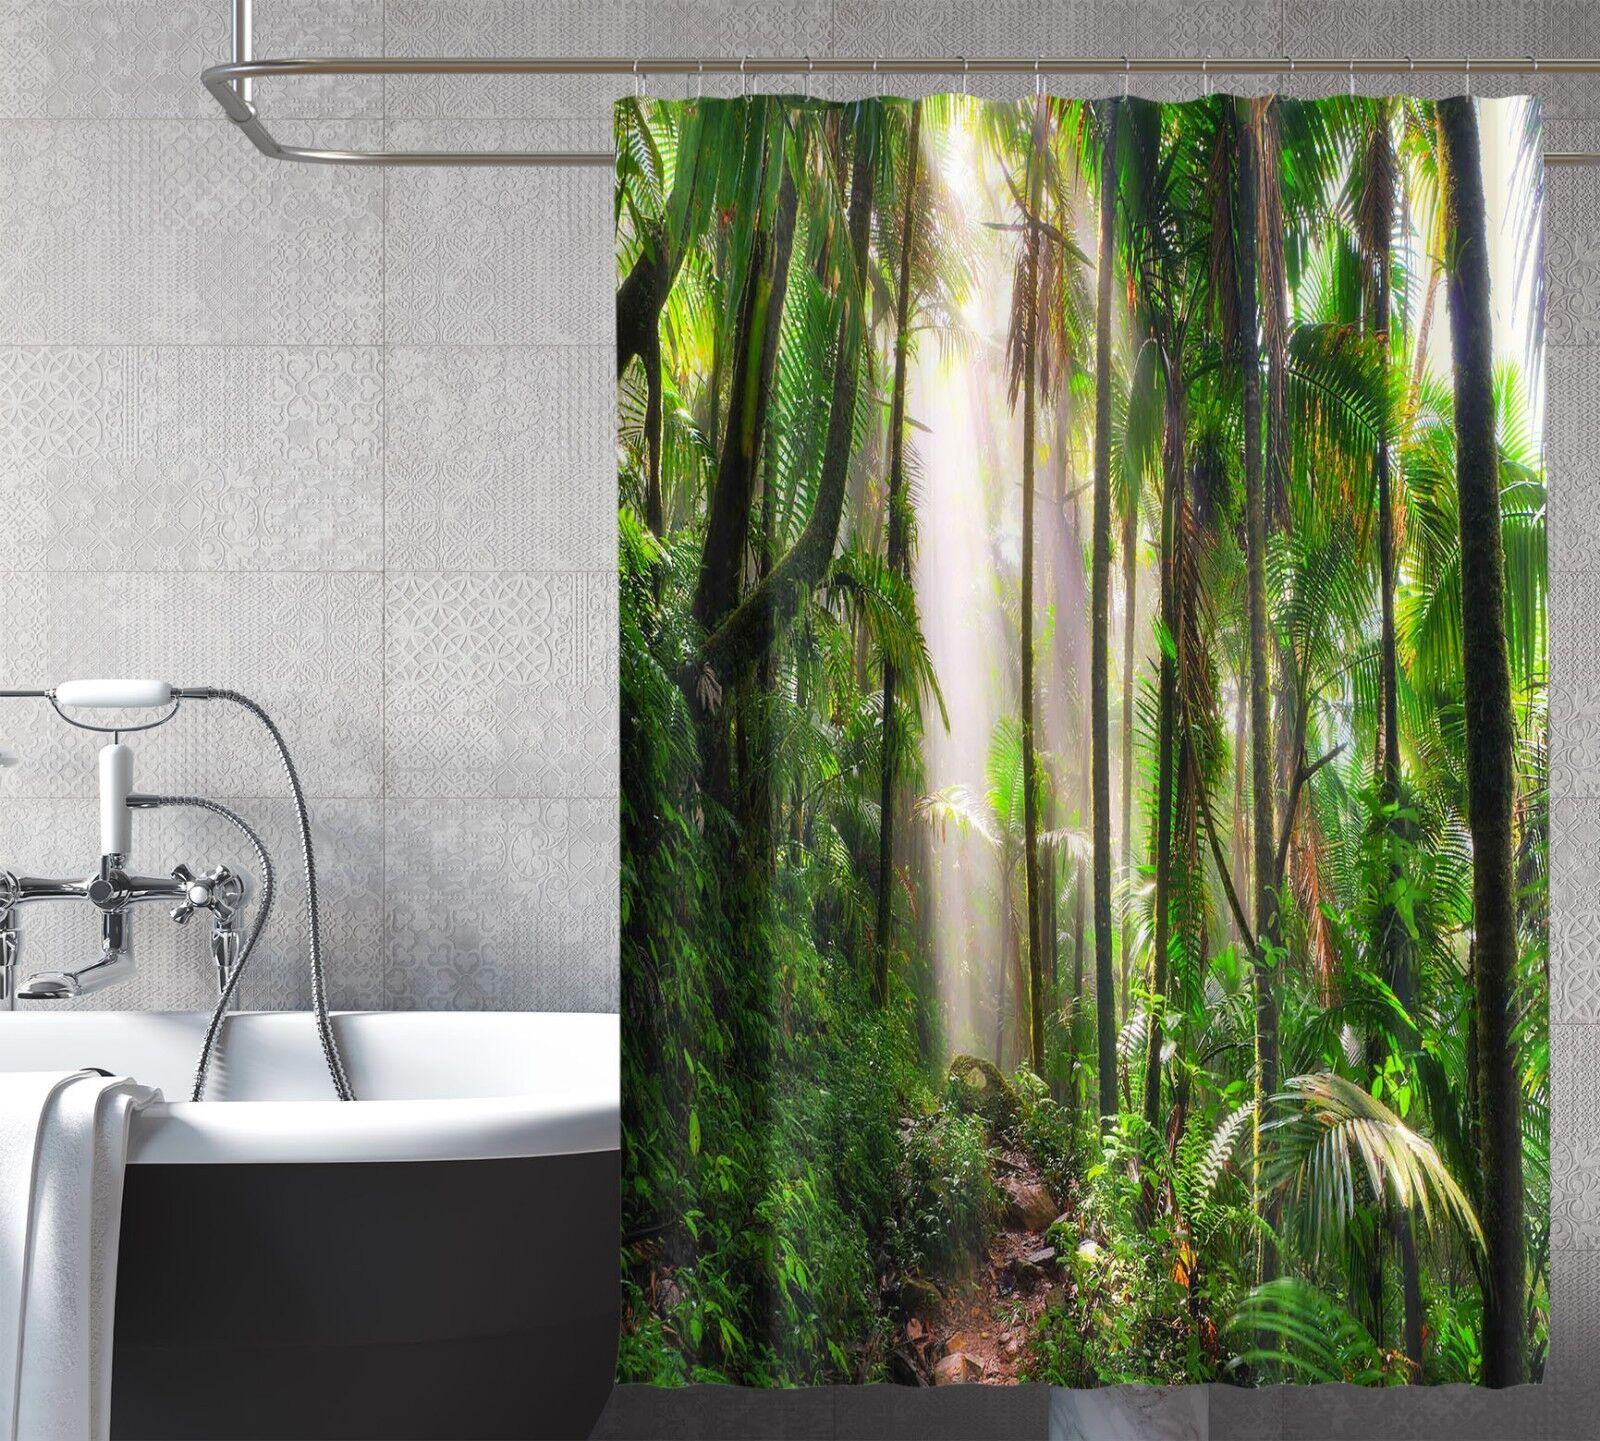 3D Gras Baum 645 Duschvorhang Wasserdicht Faser Bad Daheim Windows Toilette DE |